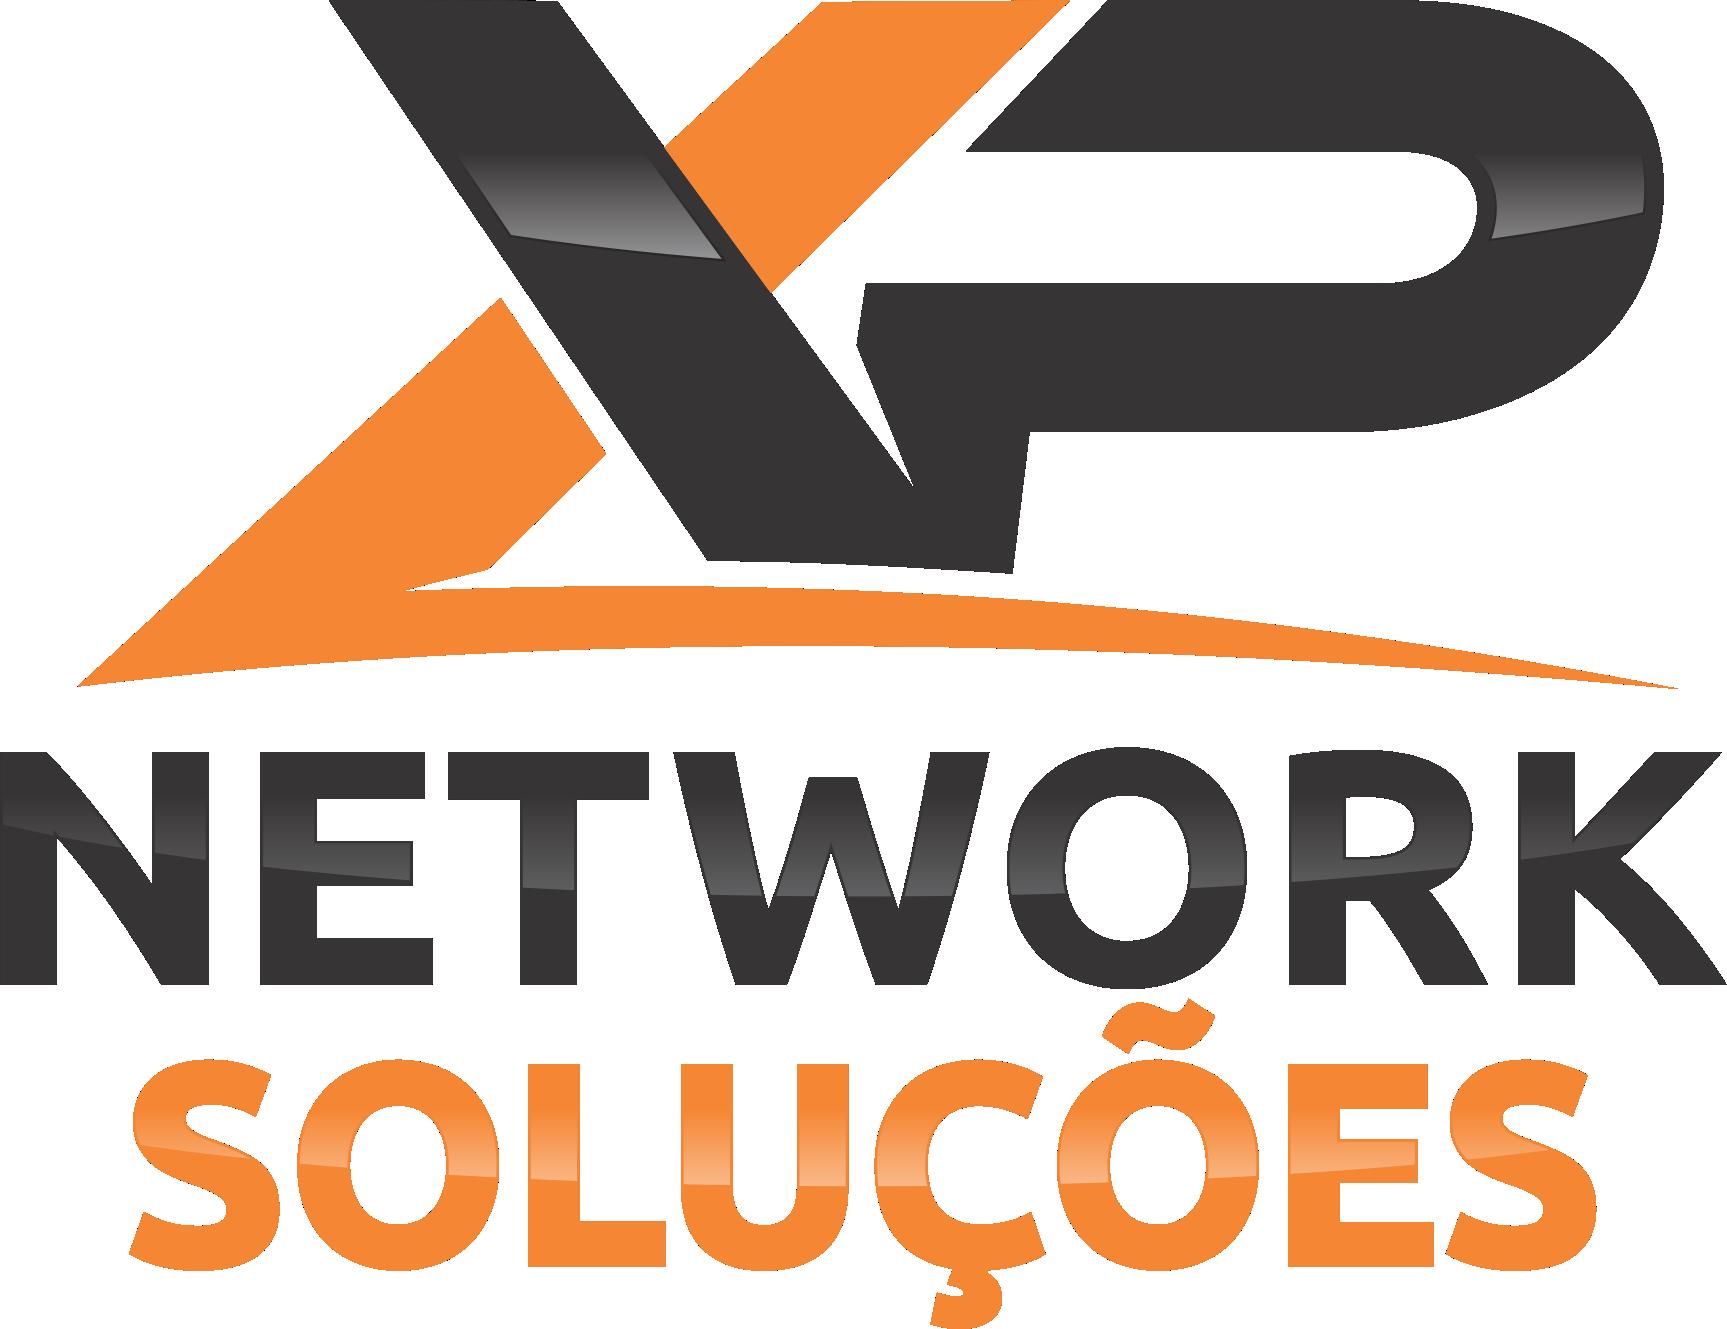 XP Network Soluções